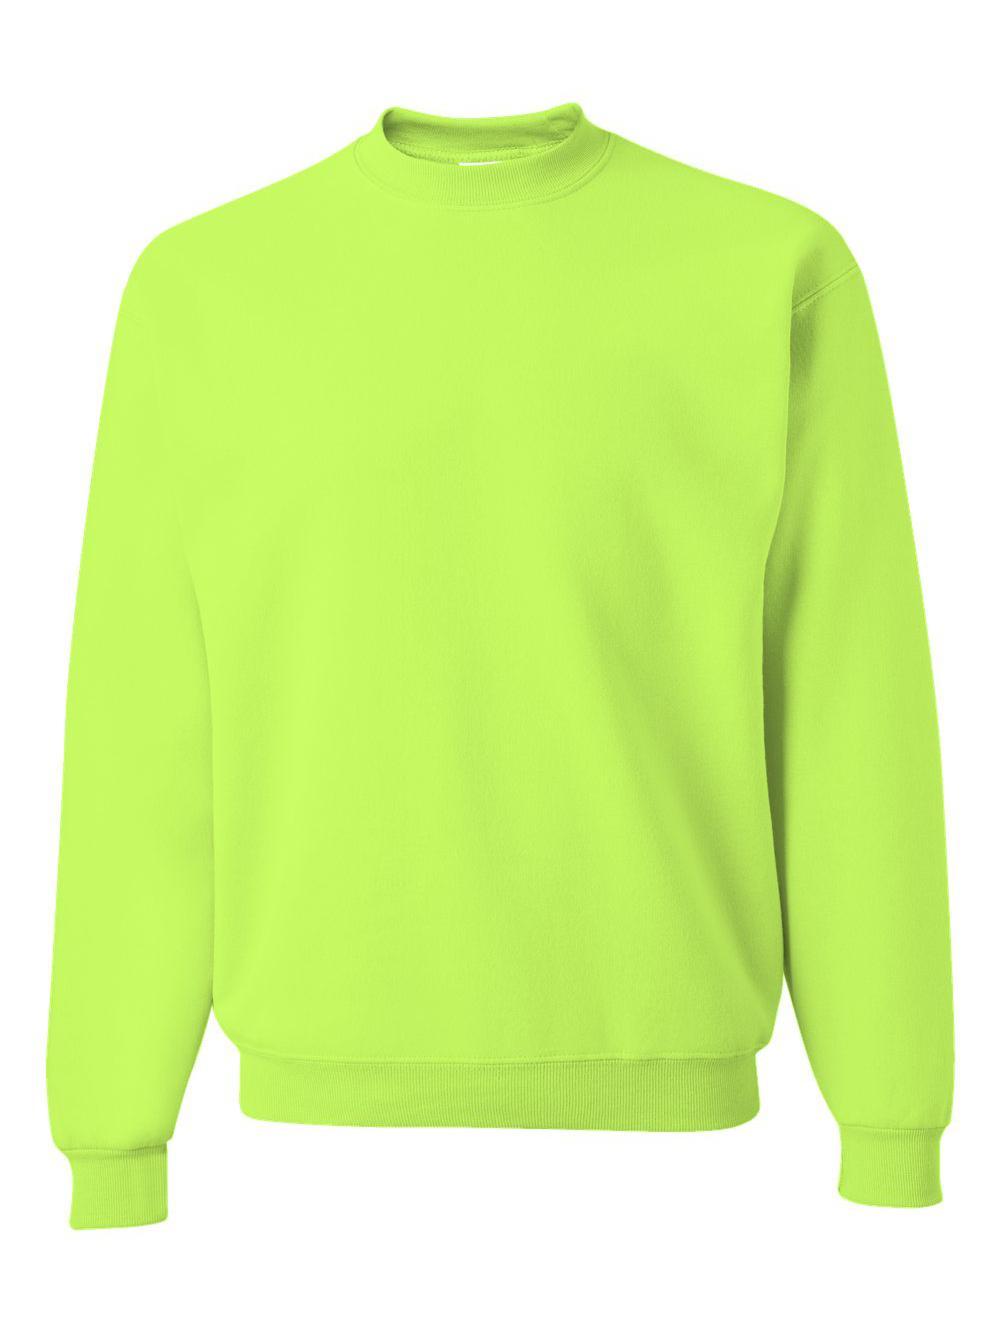 Jerzees-NuBlend-Crewneck-Sweatshirt-562MR thumbnail 75